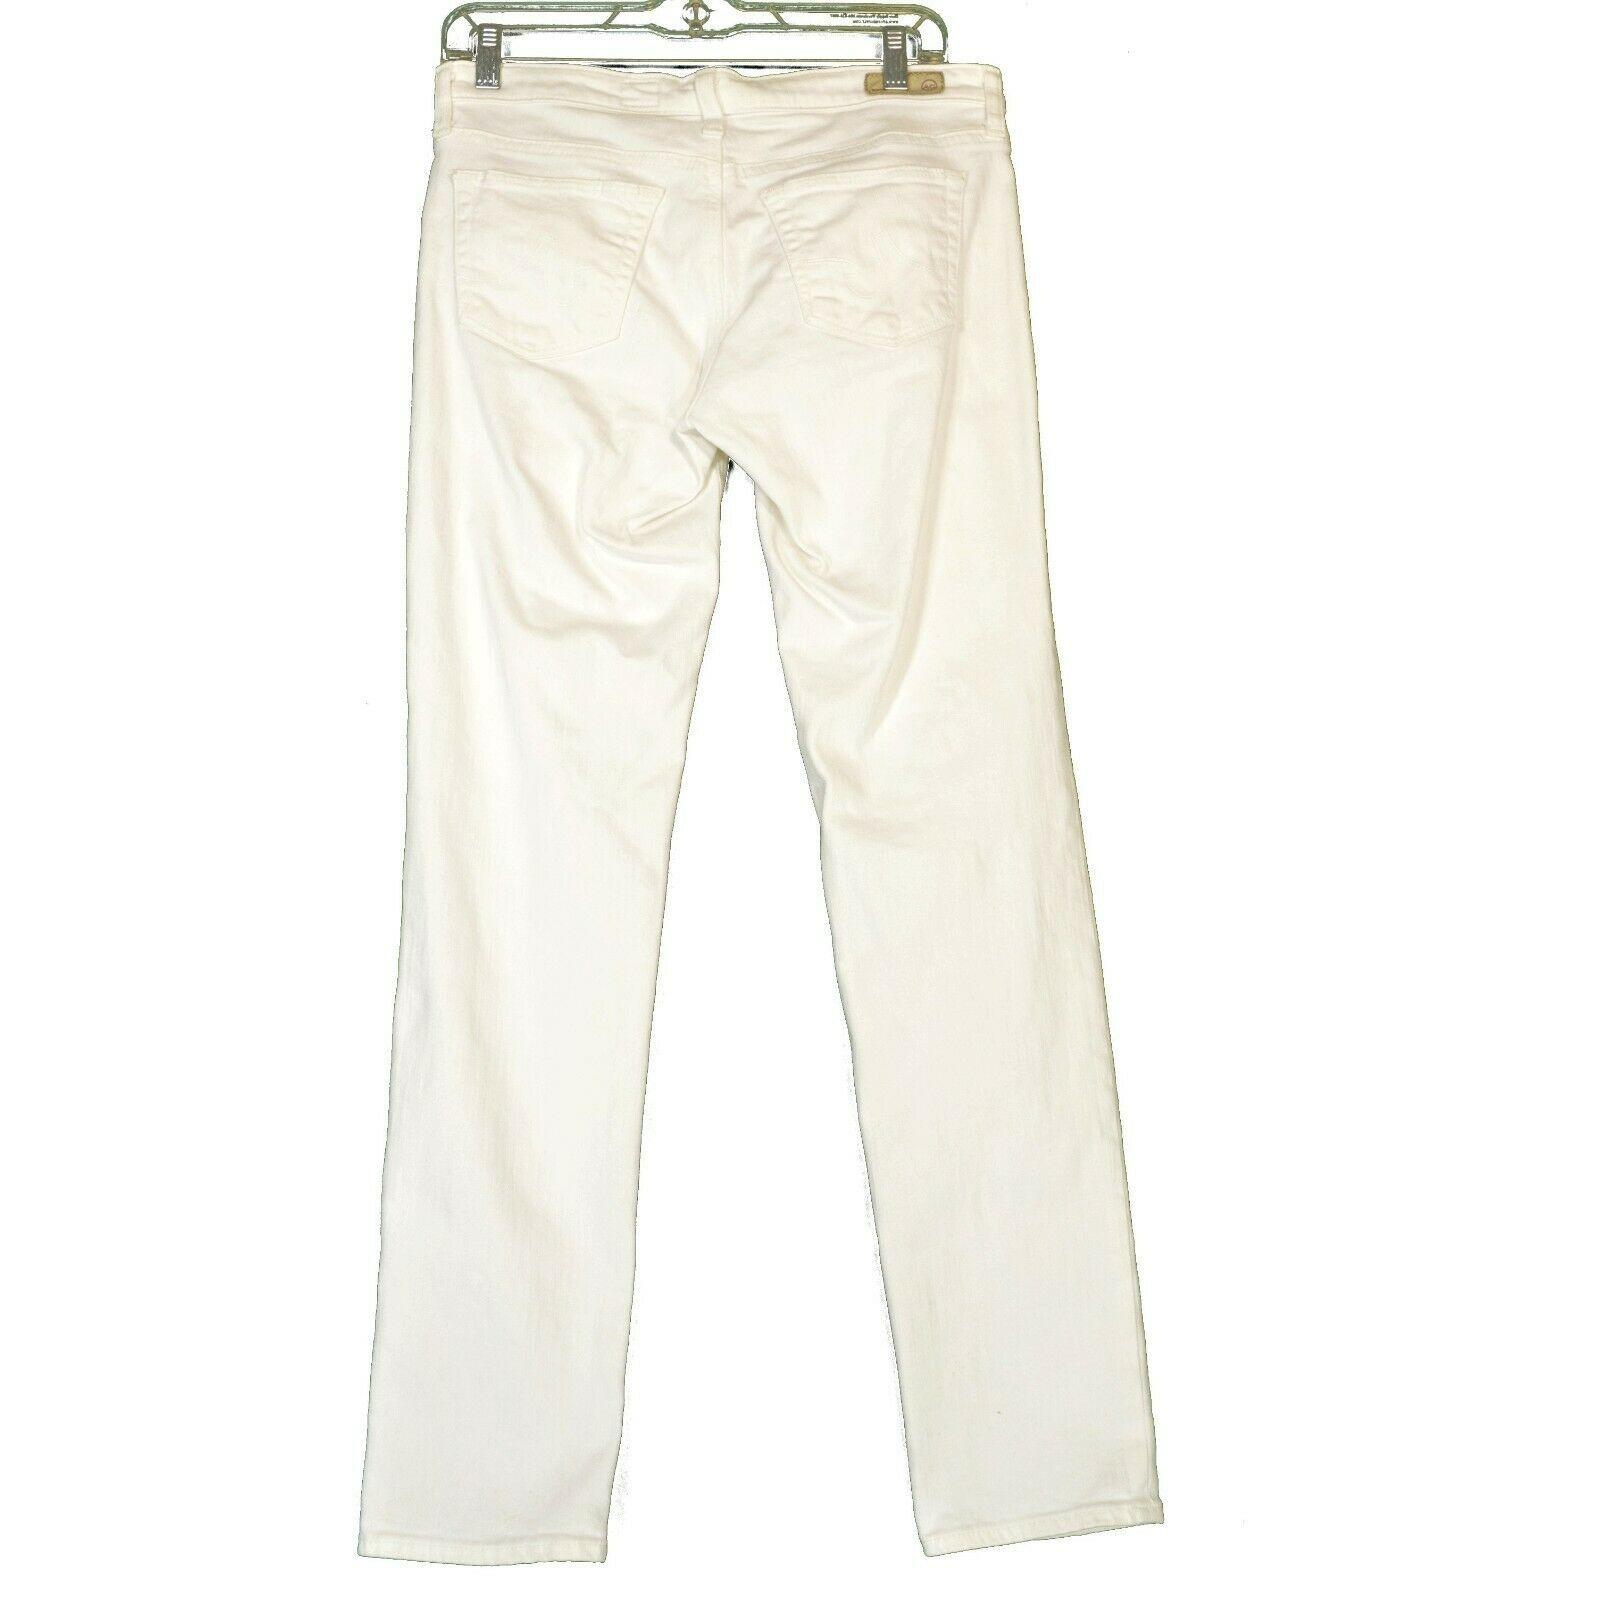 AG Adriano Goldschmied jeans 29 x 31 Stilt cigarette leg White thick EUCUSA image 9